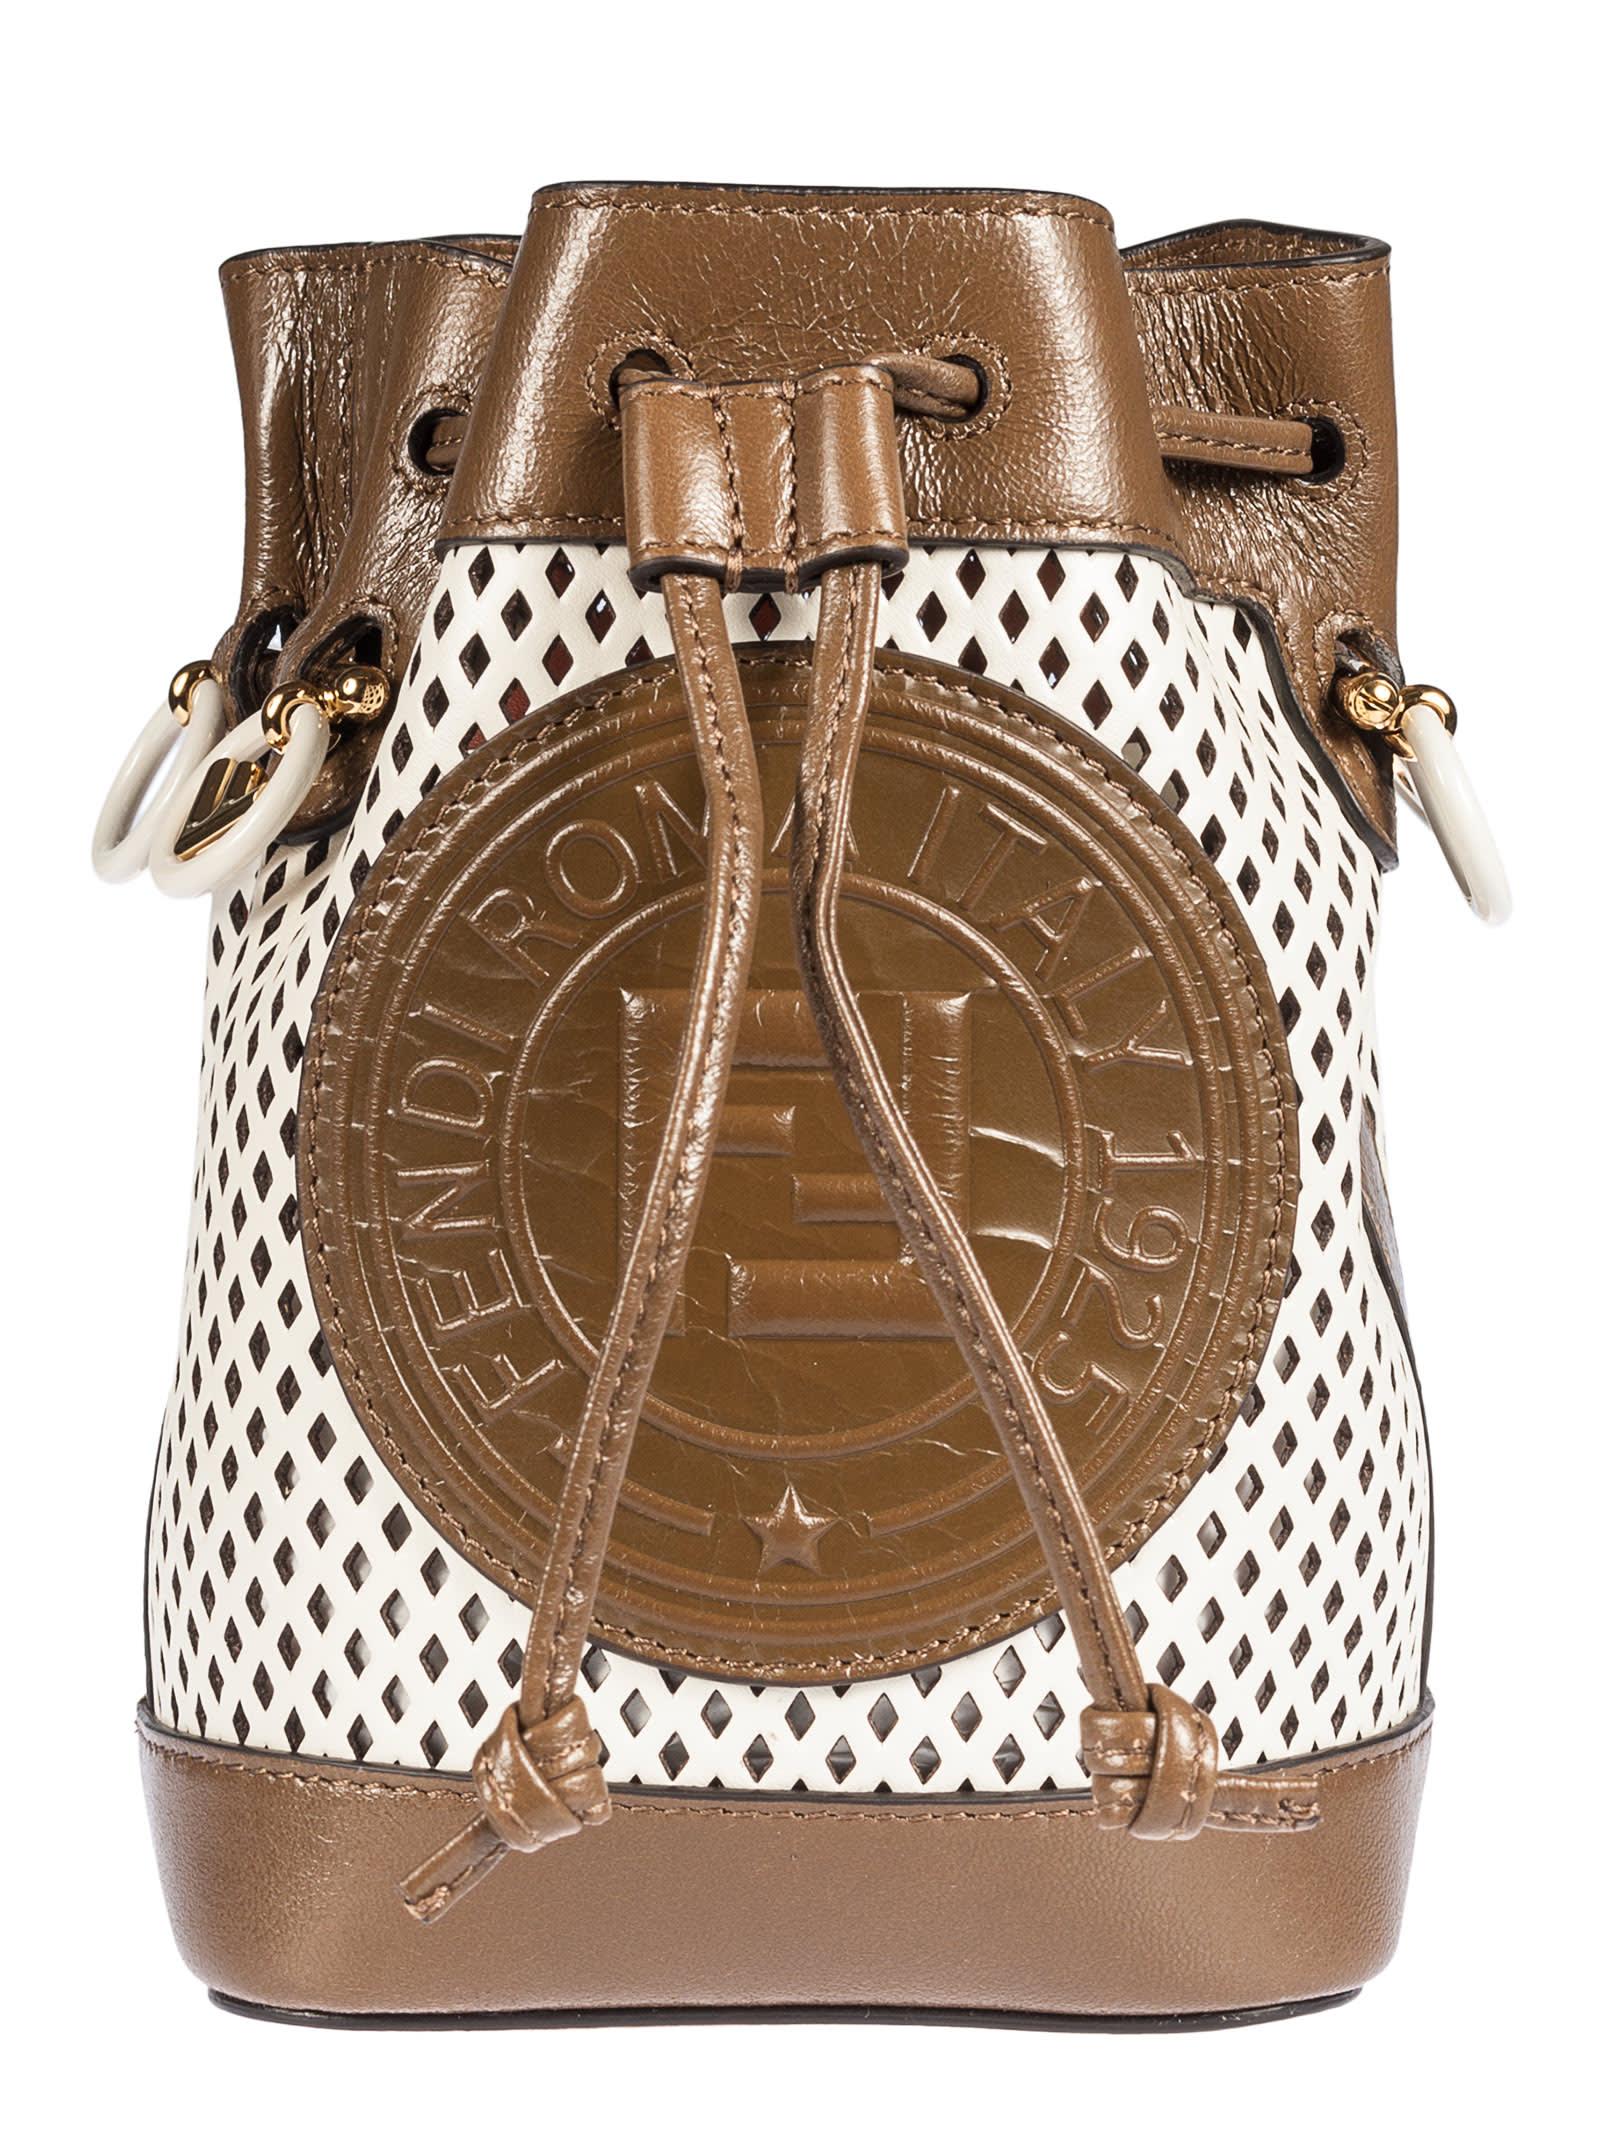 Fendi Mini Mon Tresor Perforated Bucket Bag